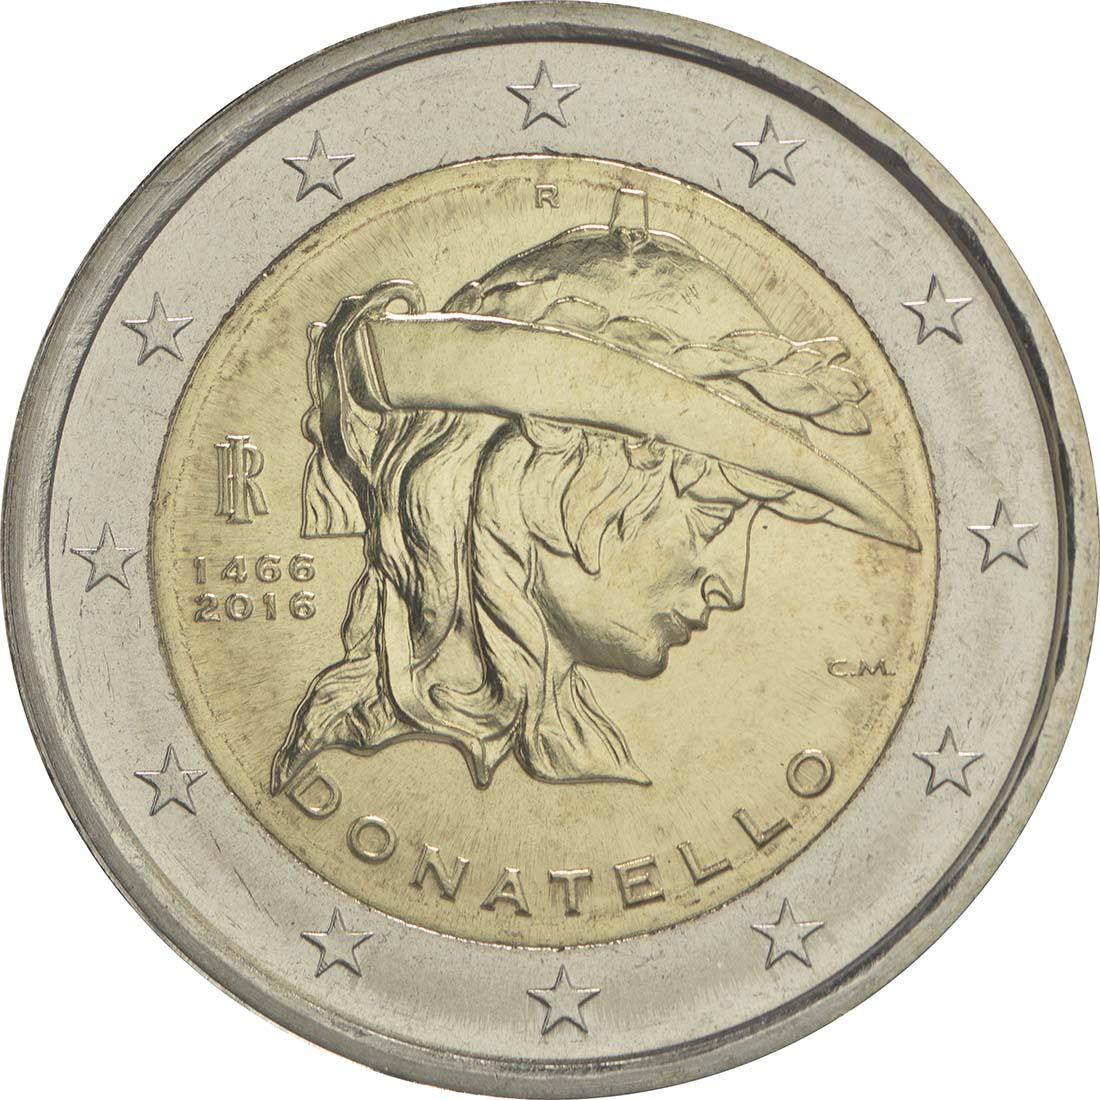 Bild der Rückseite :Italien - 2 Euro Donatello Bardi  2016 bfr